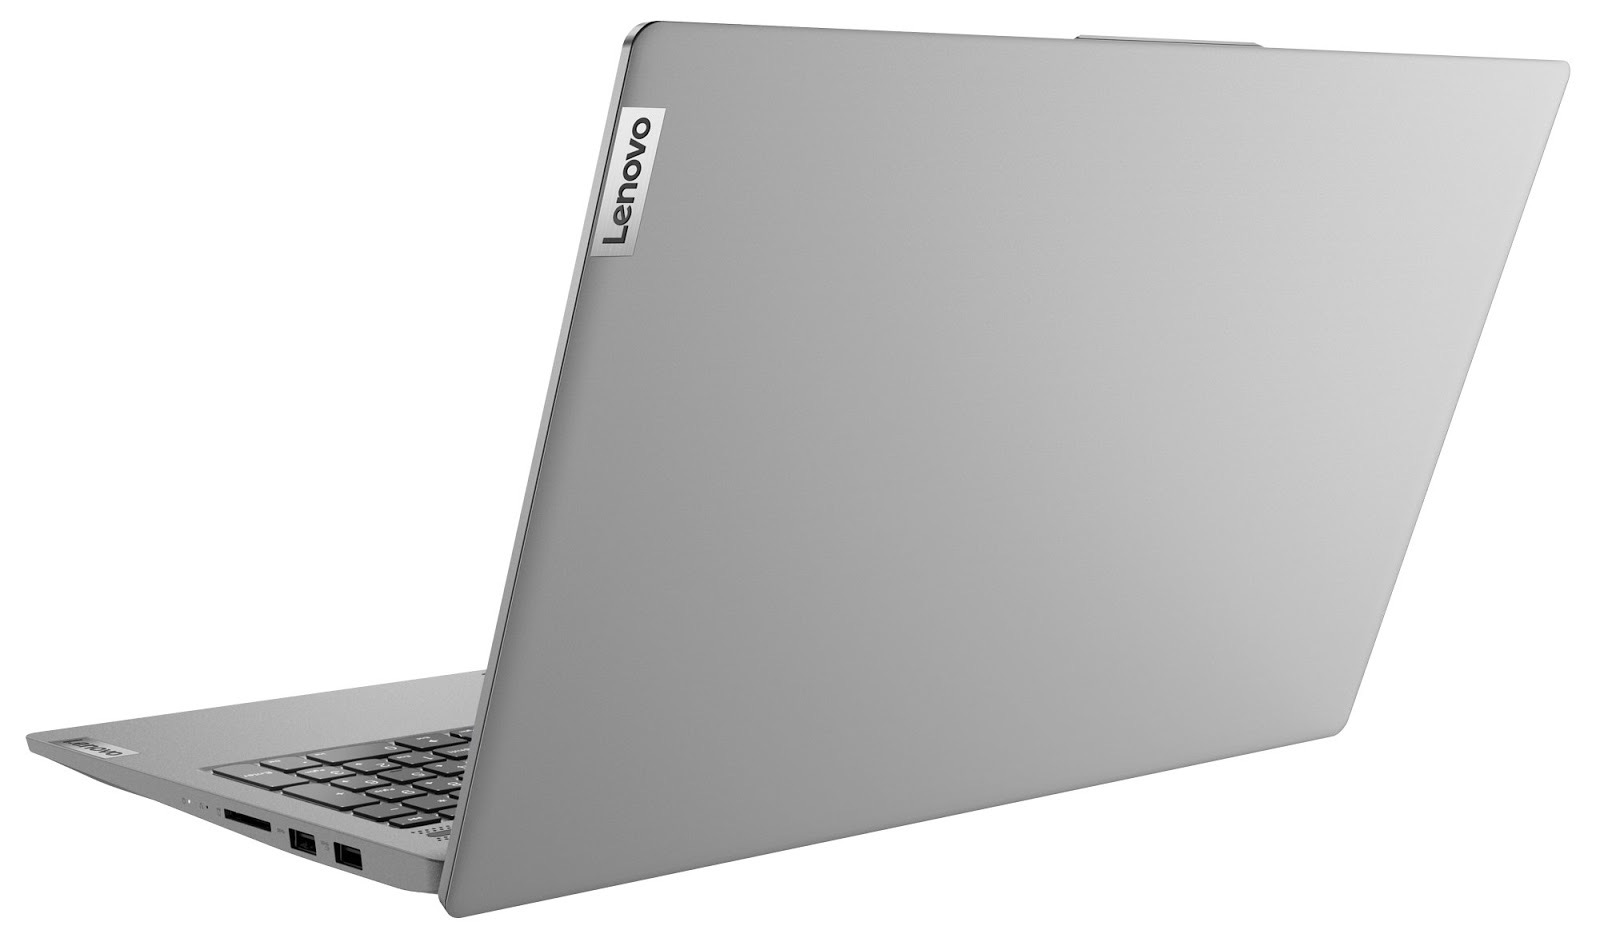 Фото 3. Ноутбук Lenovo ideapad 5 15IIL05 Platinum Grey (81YK00GBRE)